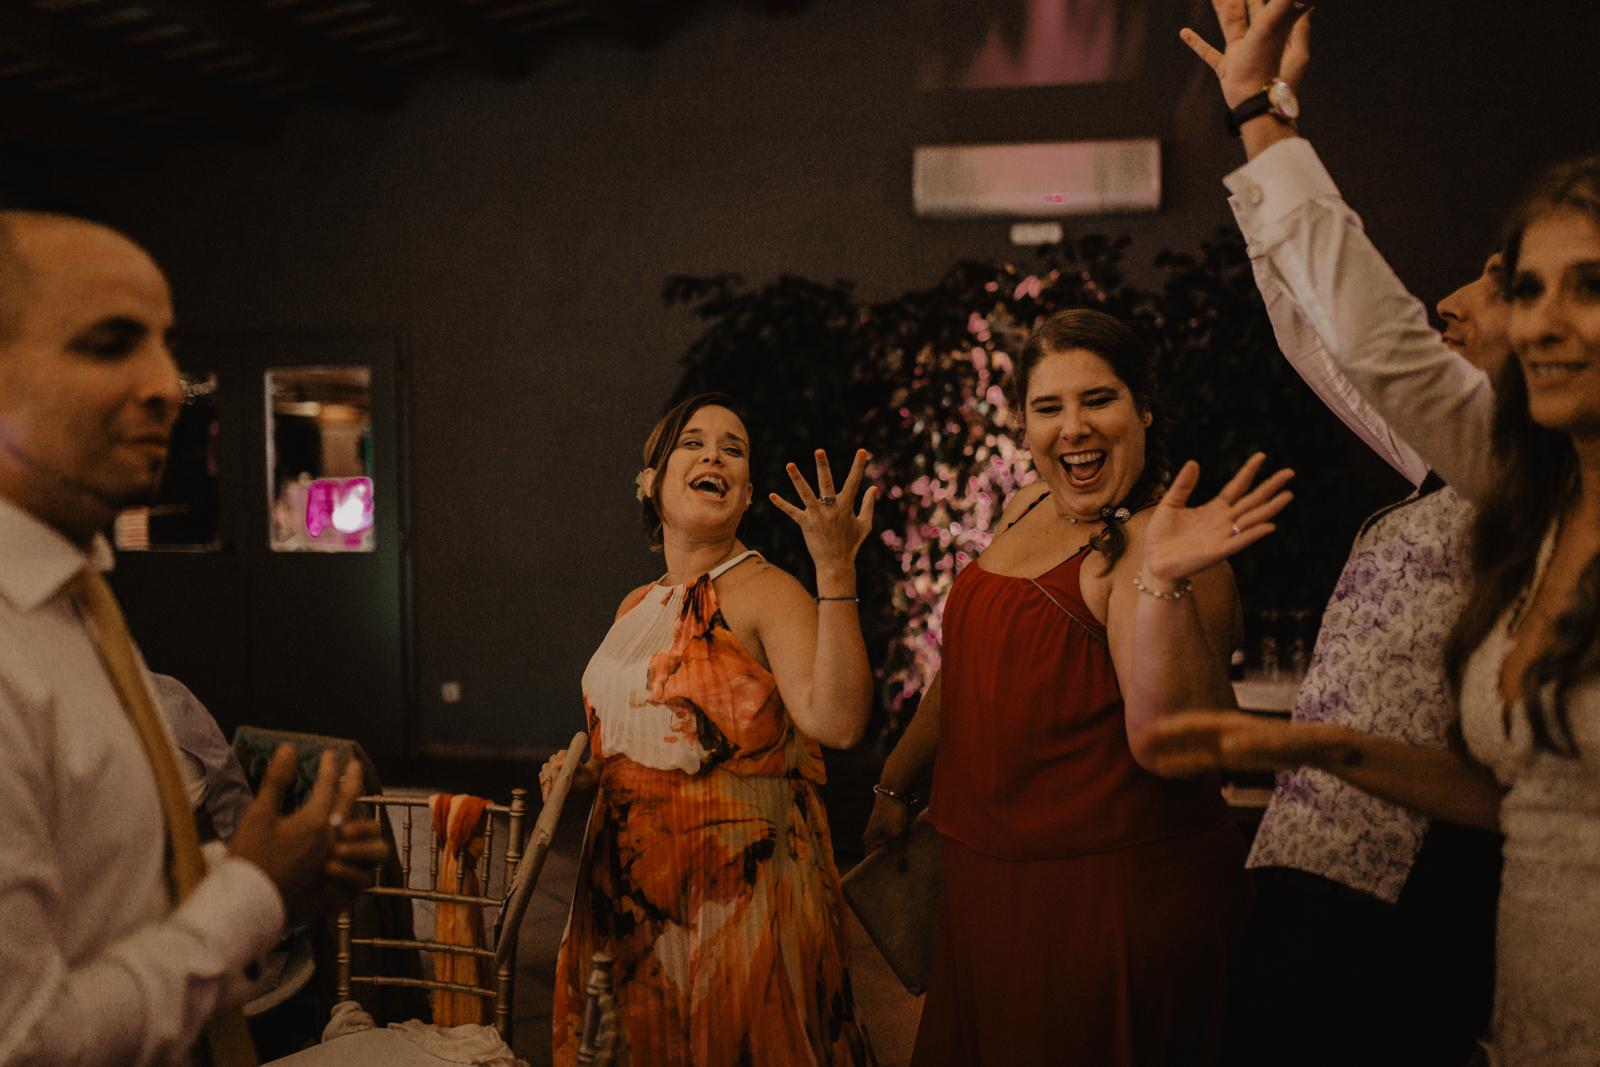 thenortherngirlphotography_photography_thenortherngirl_rebeccascabros_wedding_weddingphotography_weddingphotographer_barcelona_bodaenbarcelona_bodaenmaselmarti_bodarogeryvane-781.jpg